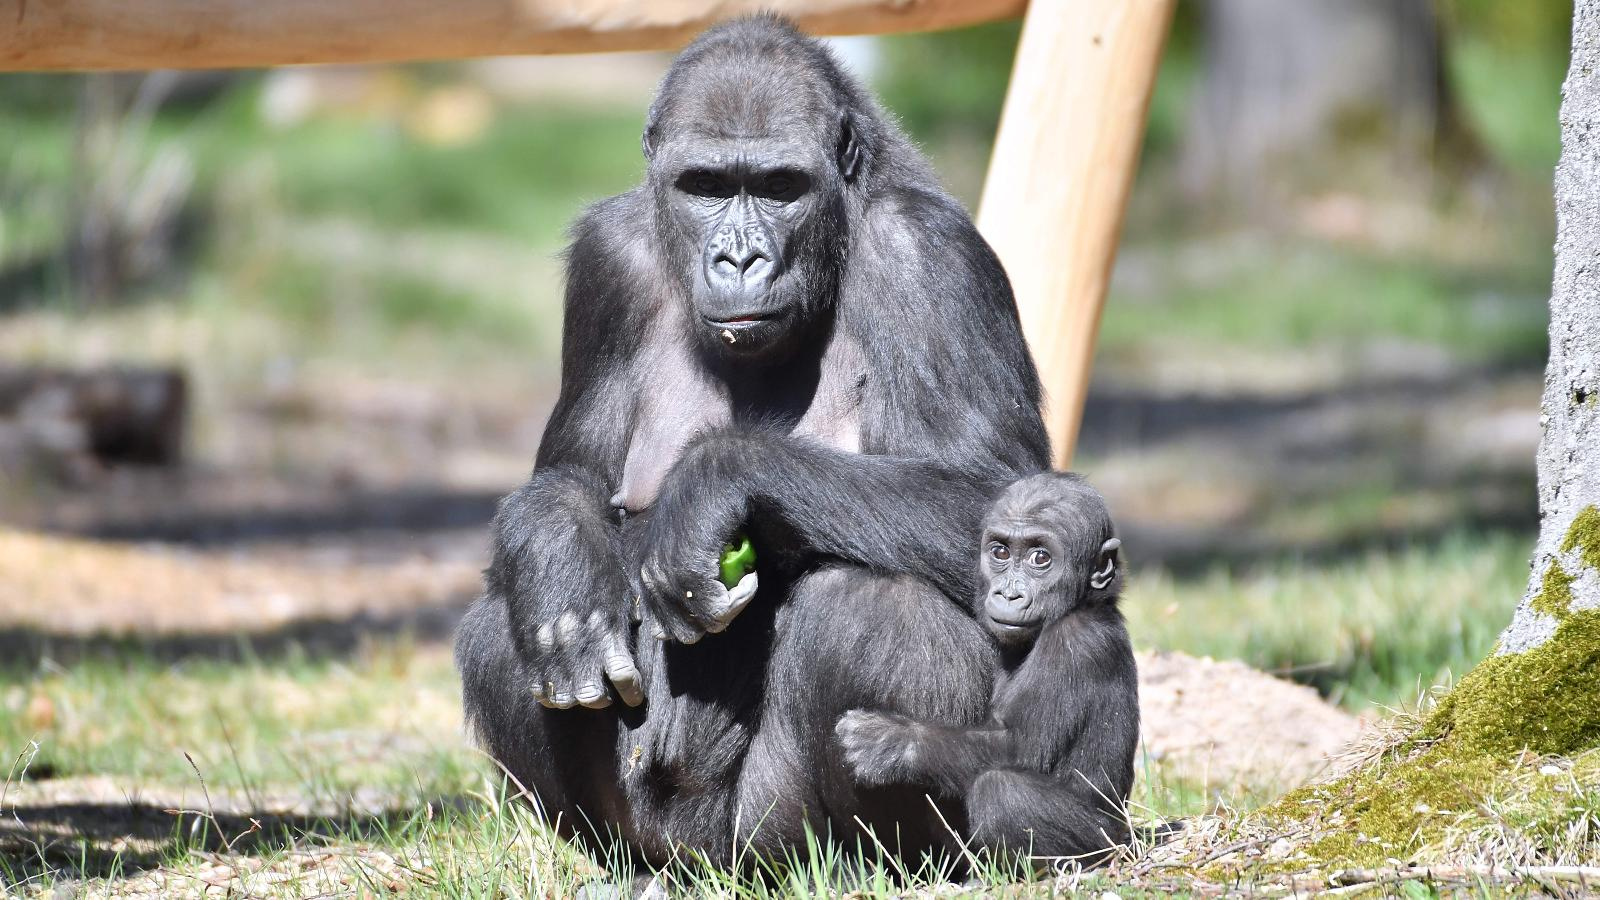 Moyo mit seiner Mutter Zola. Foto: Joachim Kloock